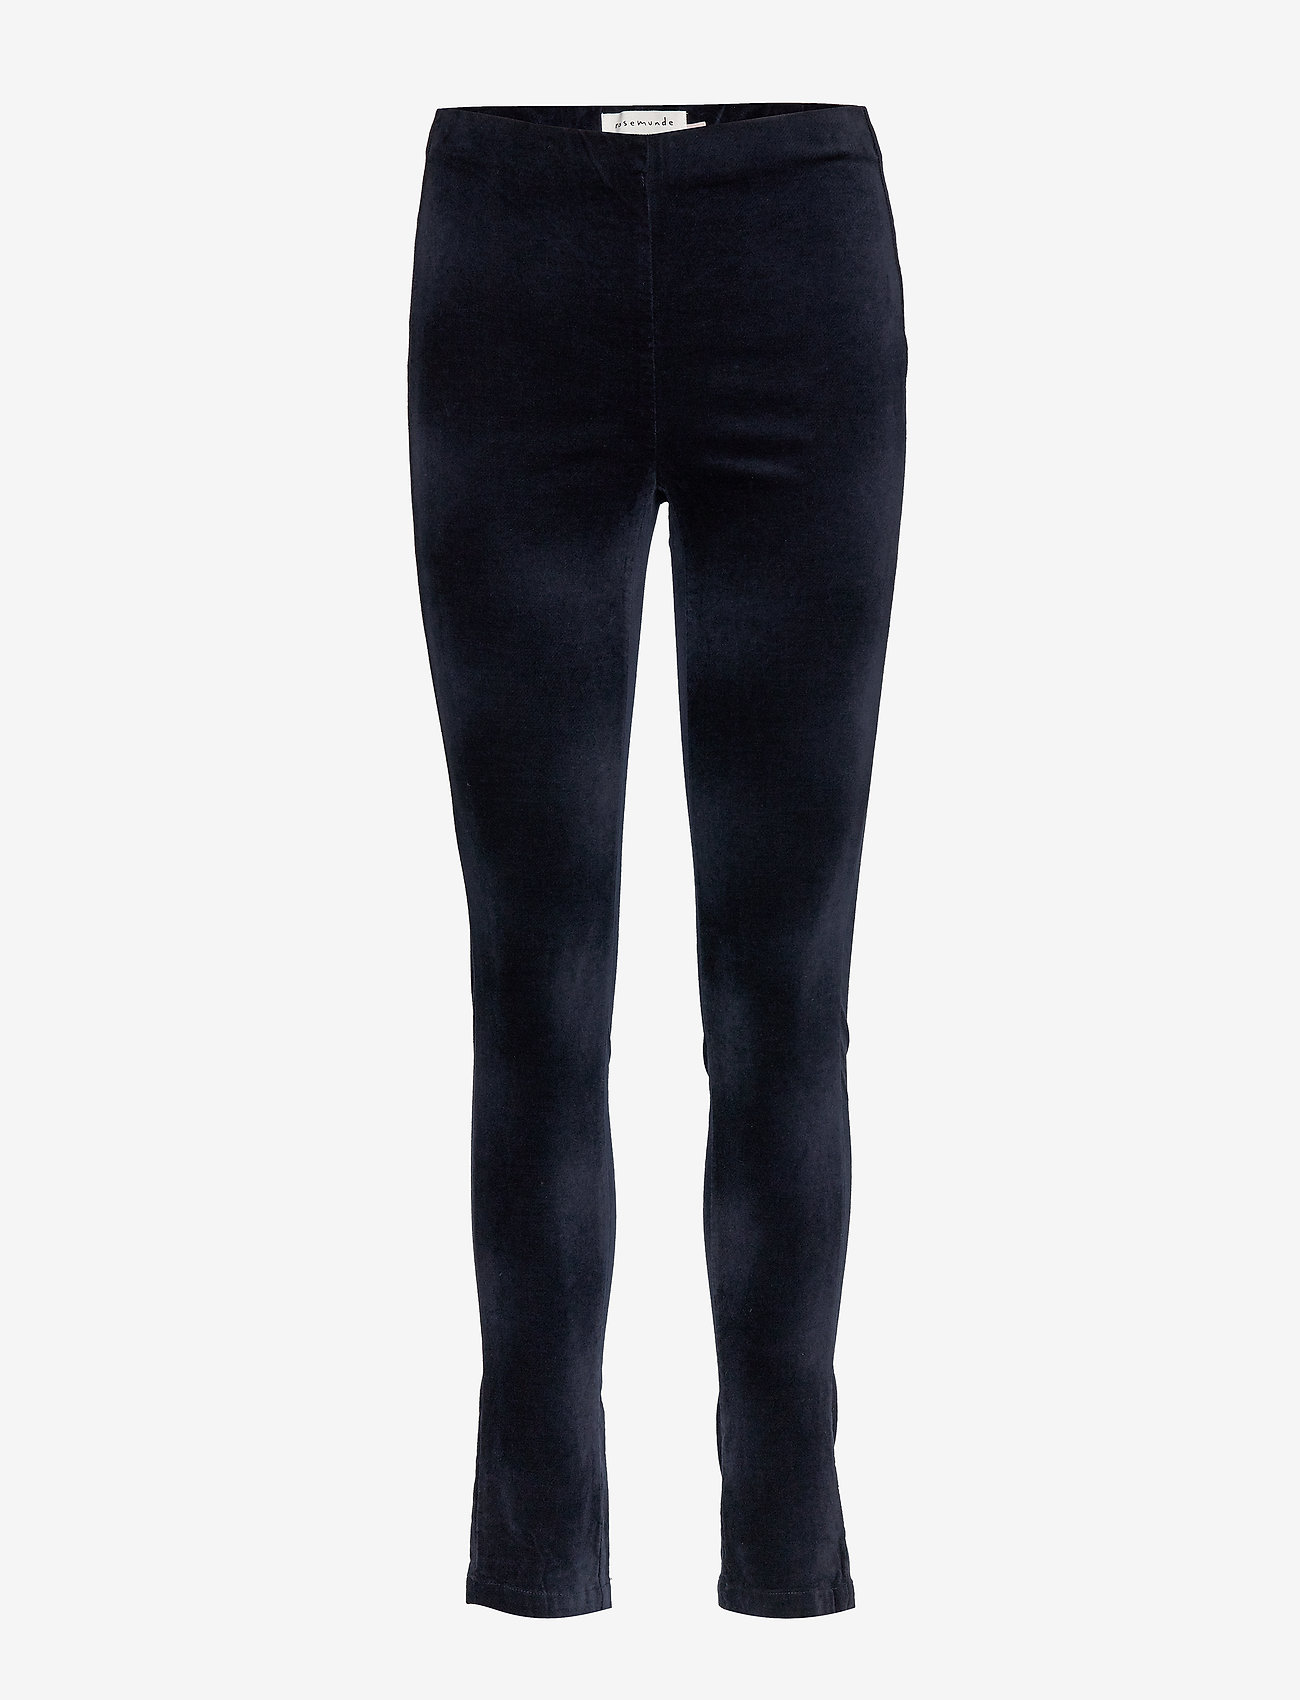 Rosemunde - Trousers - smale busker - dark blue - 0